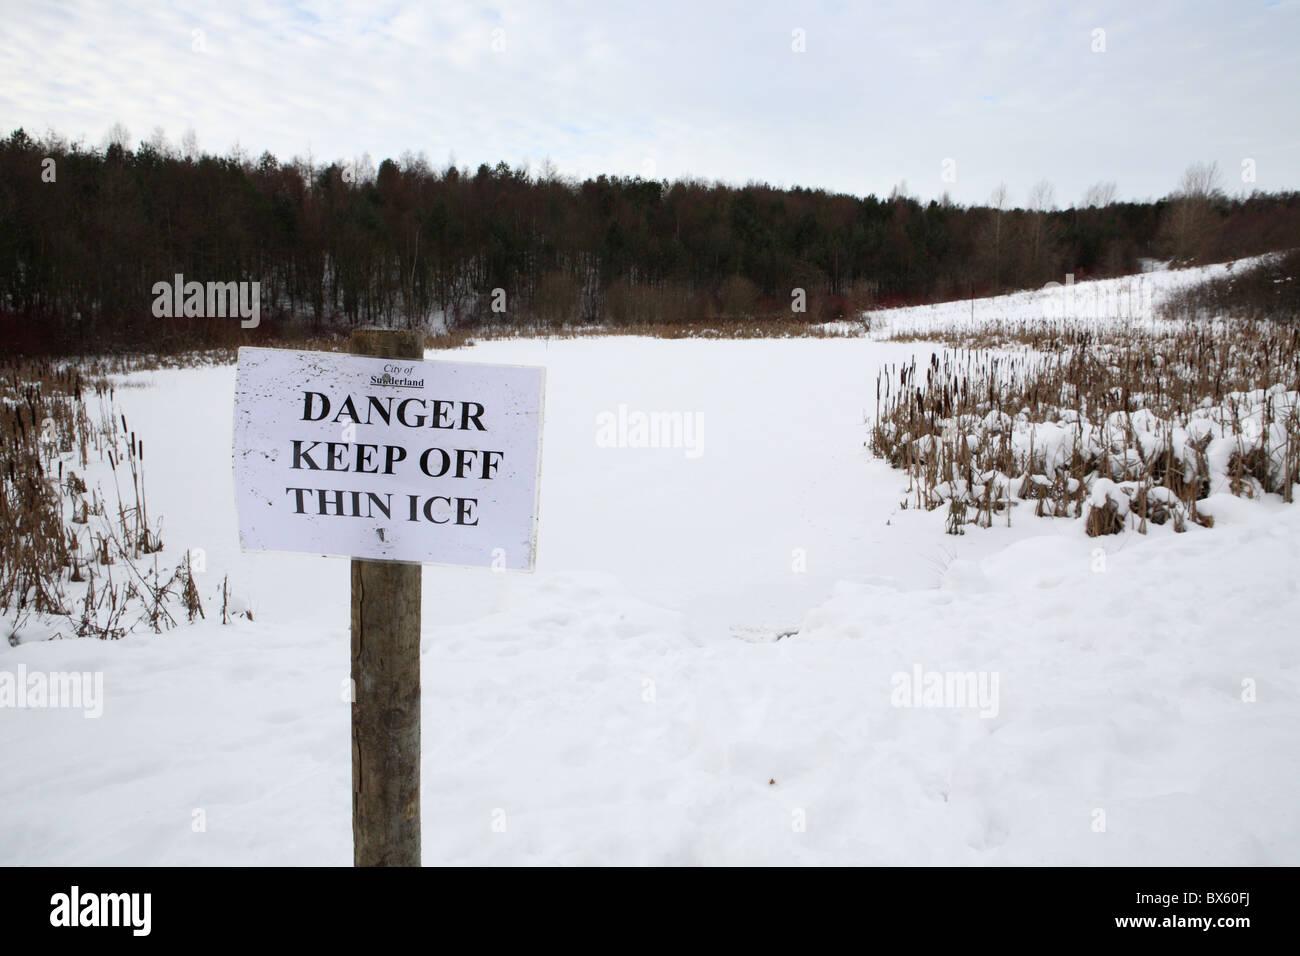 A sign saying Danger Keep Off Thin Ice, James Steel park, Washington, England, UK - Stock Image